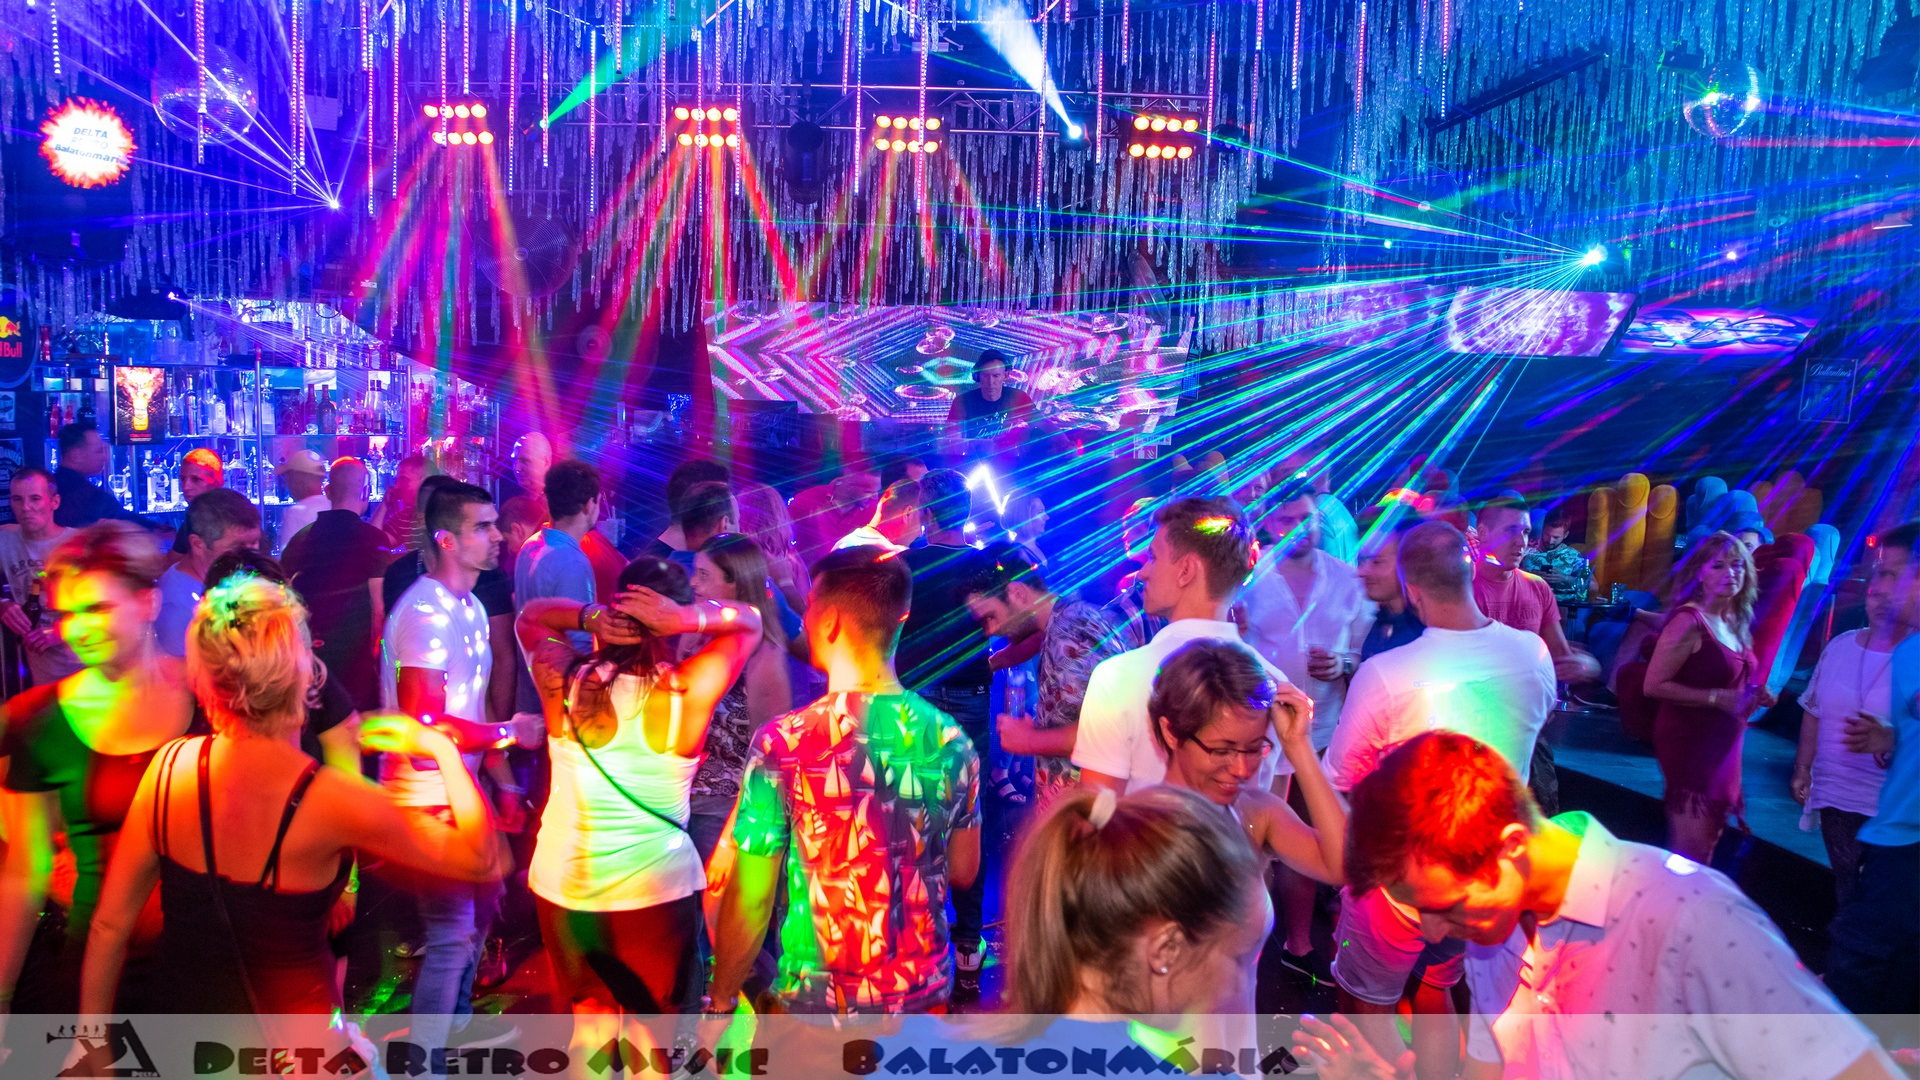 luxfunk-radio-funky-party_200807_delta retro-music-factory_069